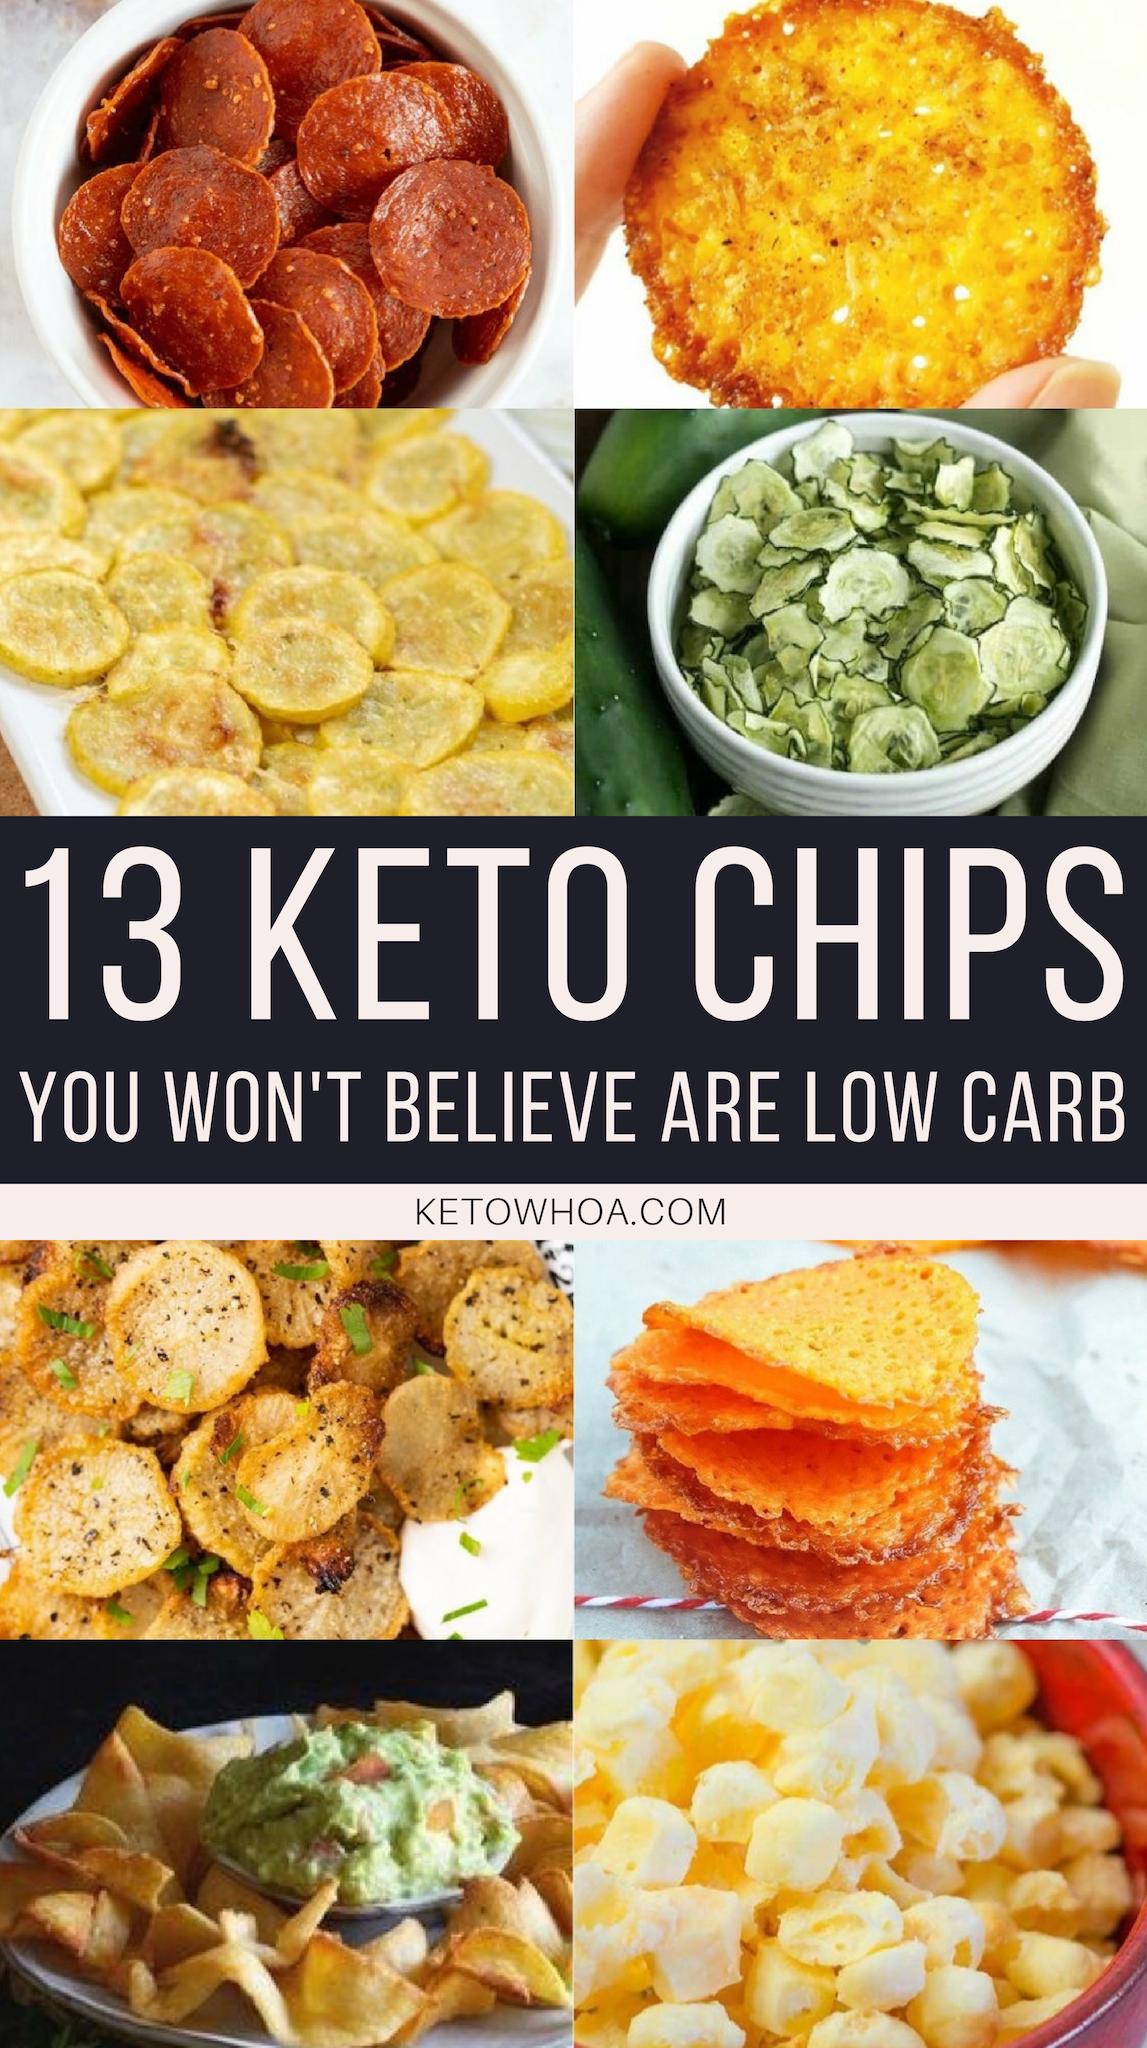 good snack on keto diet